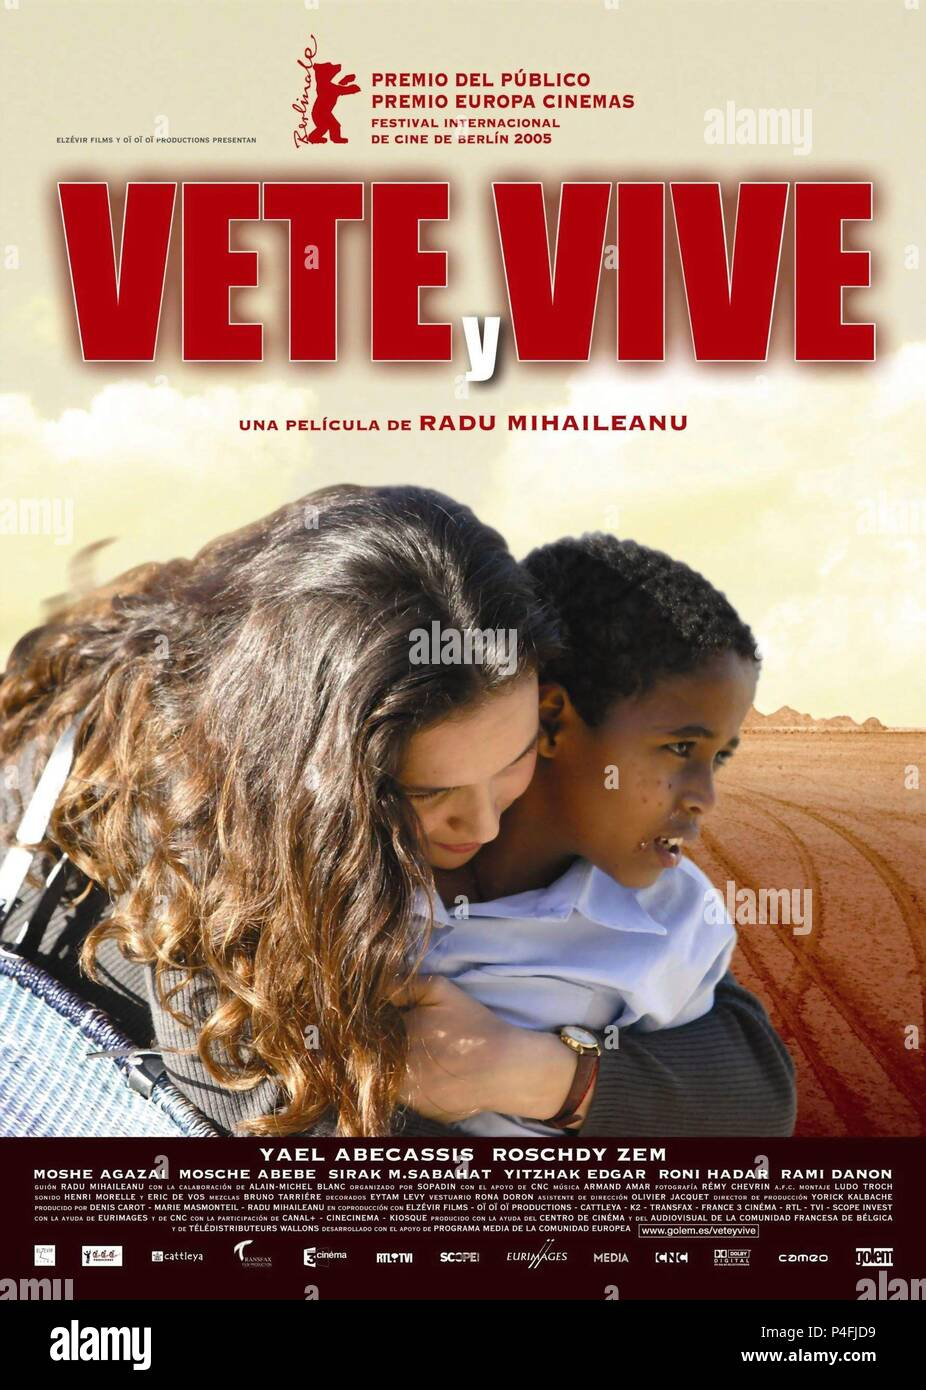 Va Vis Et Deviens Film : deviens, Original, Title:, DEVIENS., English, BECOME., Director:, MIHAILEANU., Year:, 2005., Credit:, ELZEVIR, FILMS, Album, Stock, Photo, Alamy